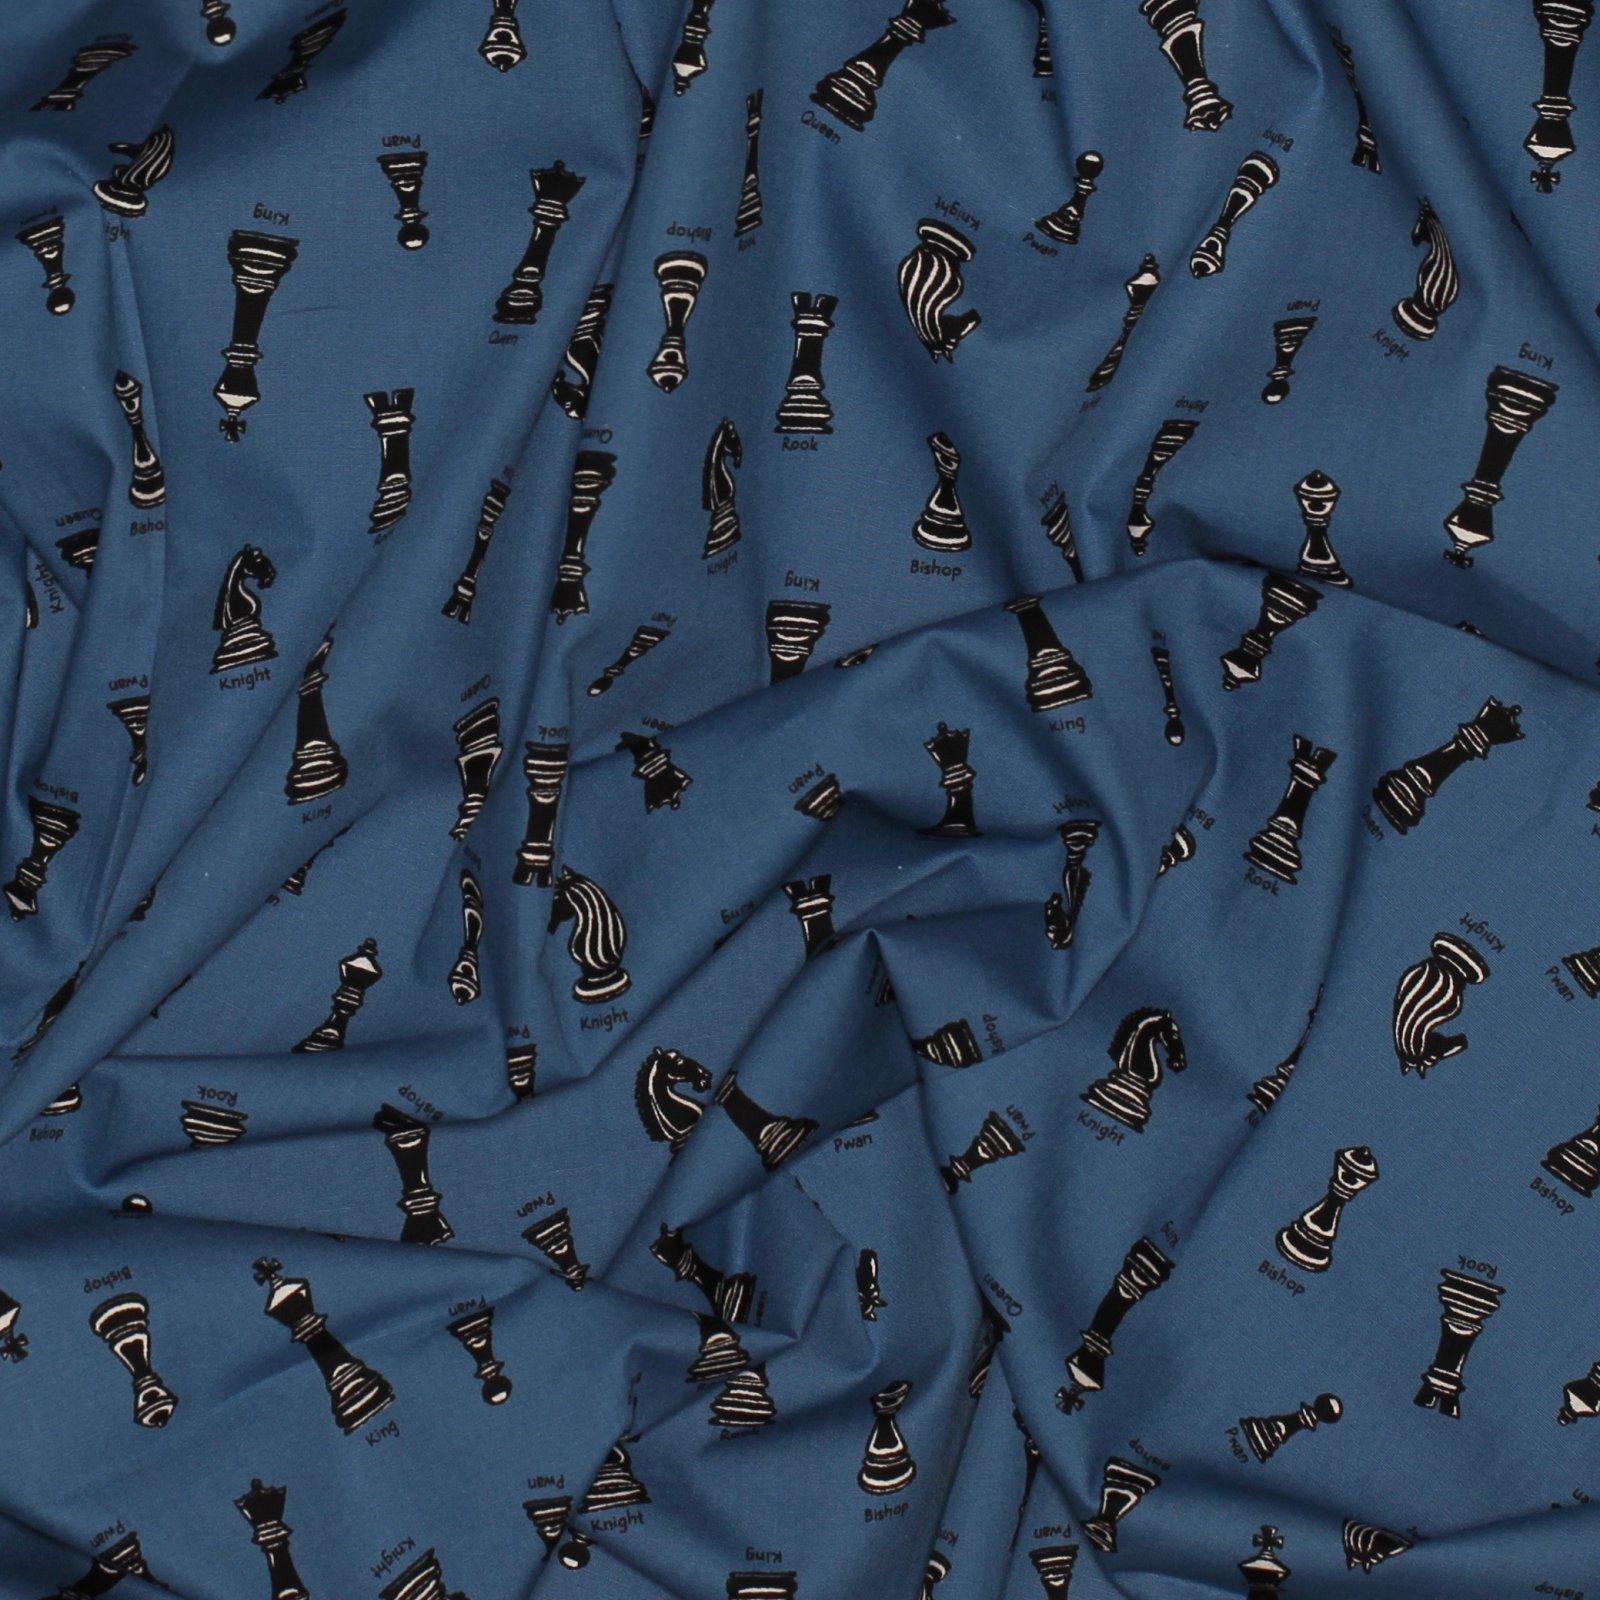 Chess Pieces on Blue - Japanese Cotton Poplin - Sevenberry